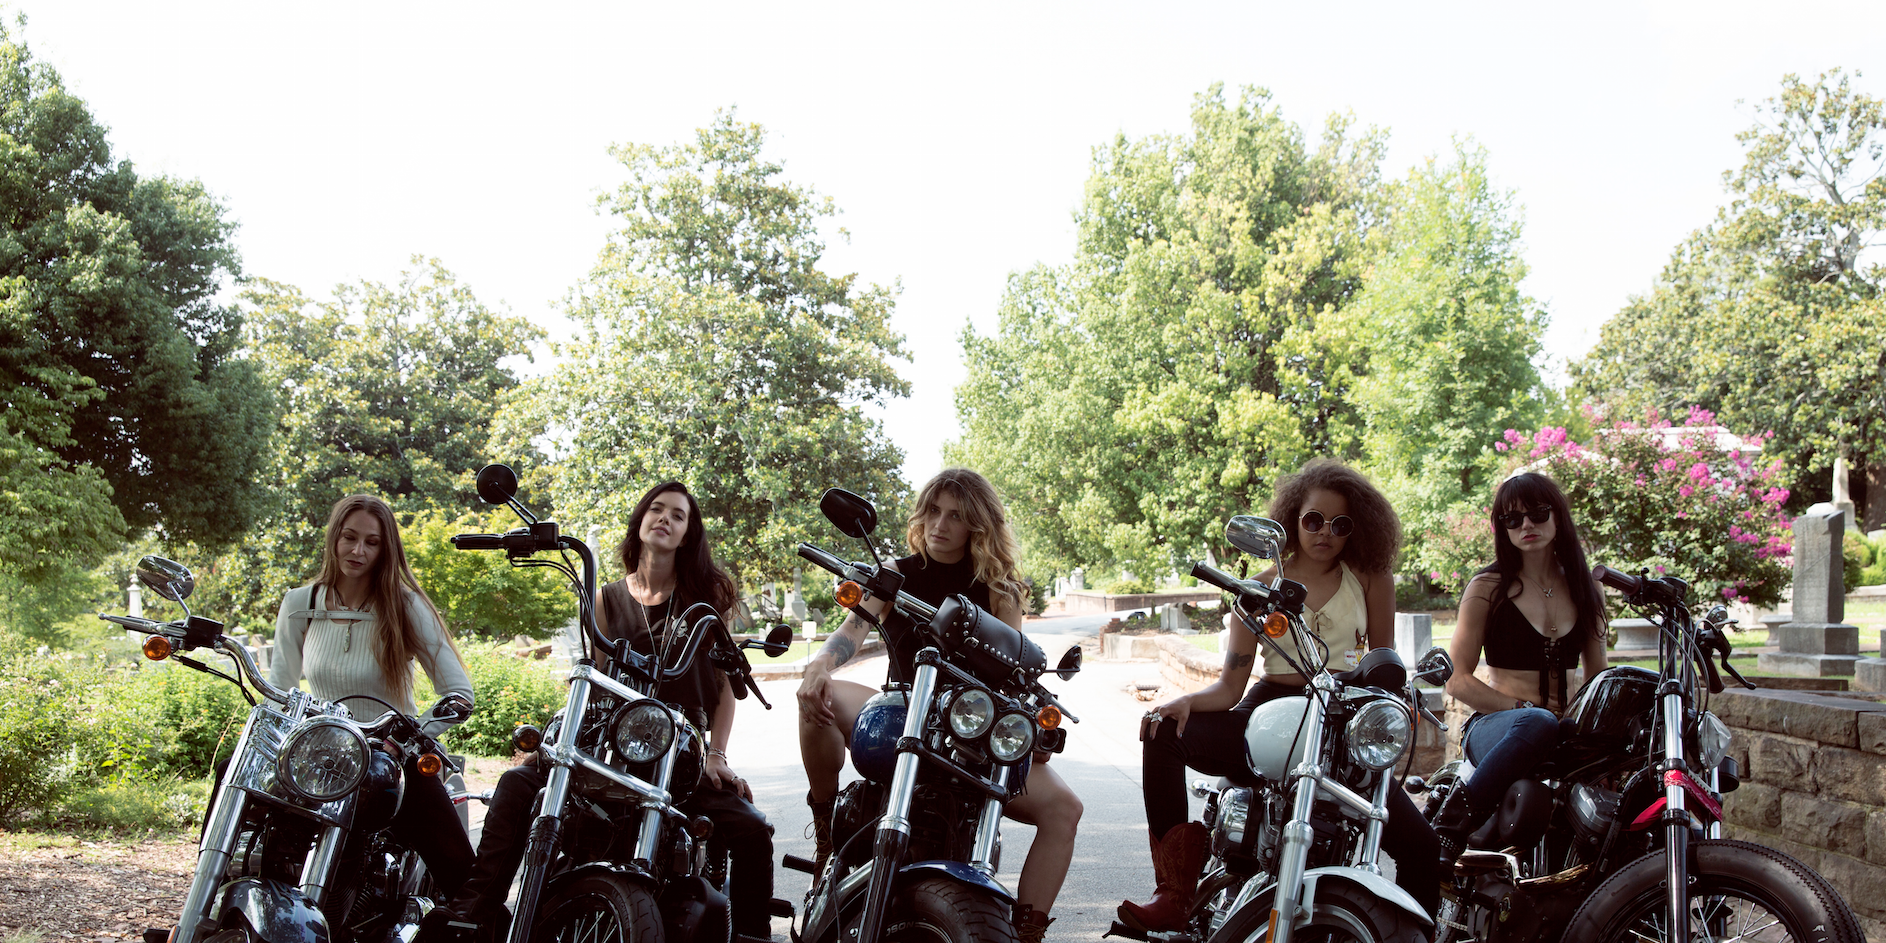 13 Photos of Badass Women on Bikes